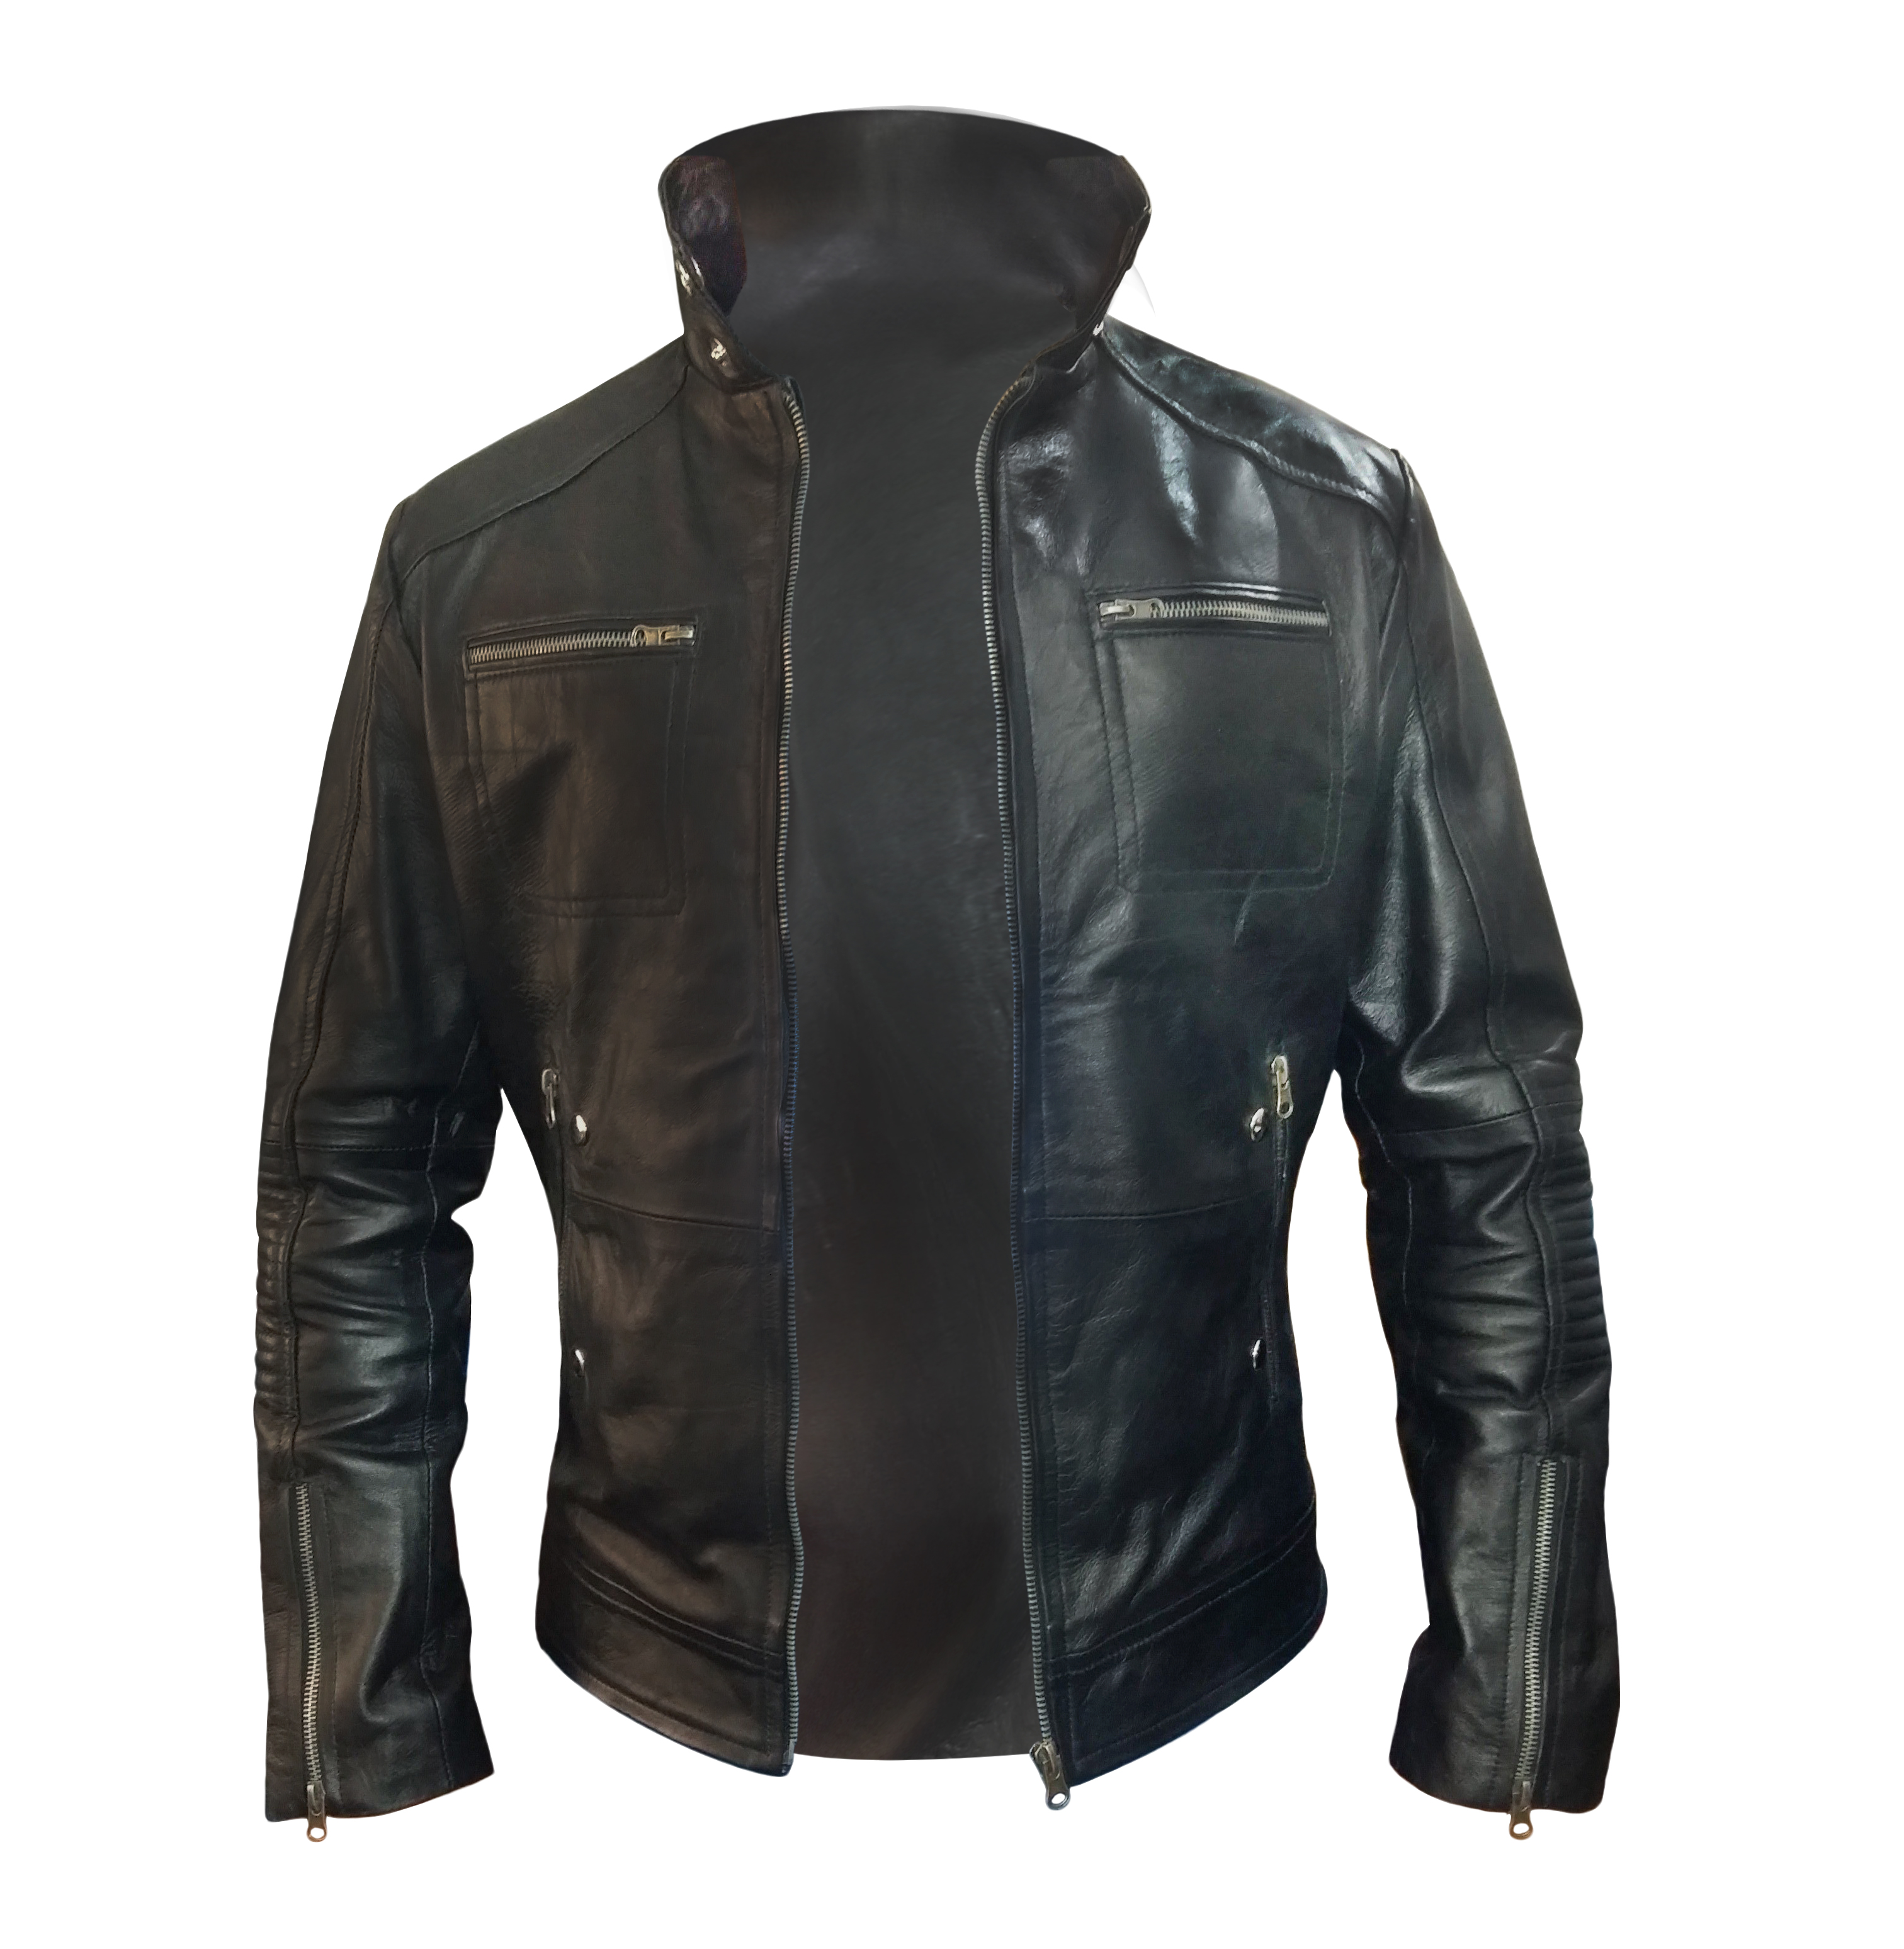 enrique iglesias black jacket front